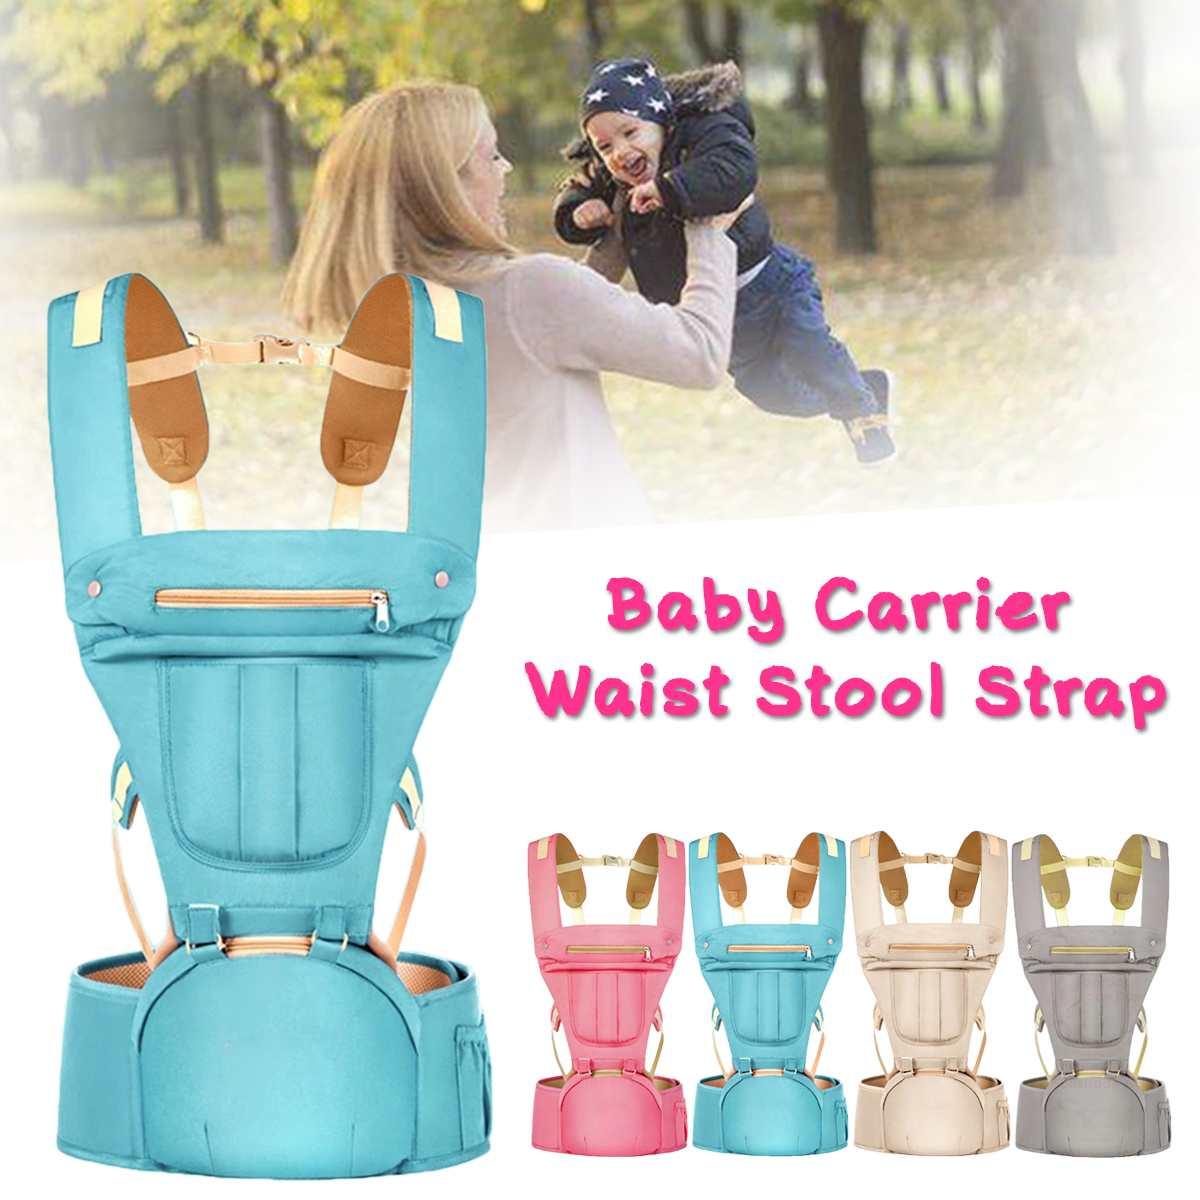 Ergonomic Baby Carrier Infant Kid Baby Sling Waist Stool Front Facing Kangaroo Baby Wrap Carrier Backpack Carrying Belt